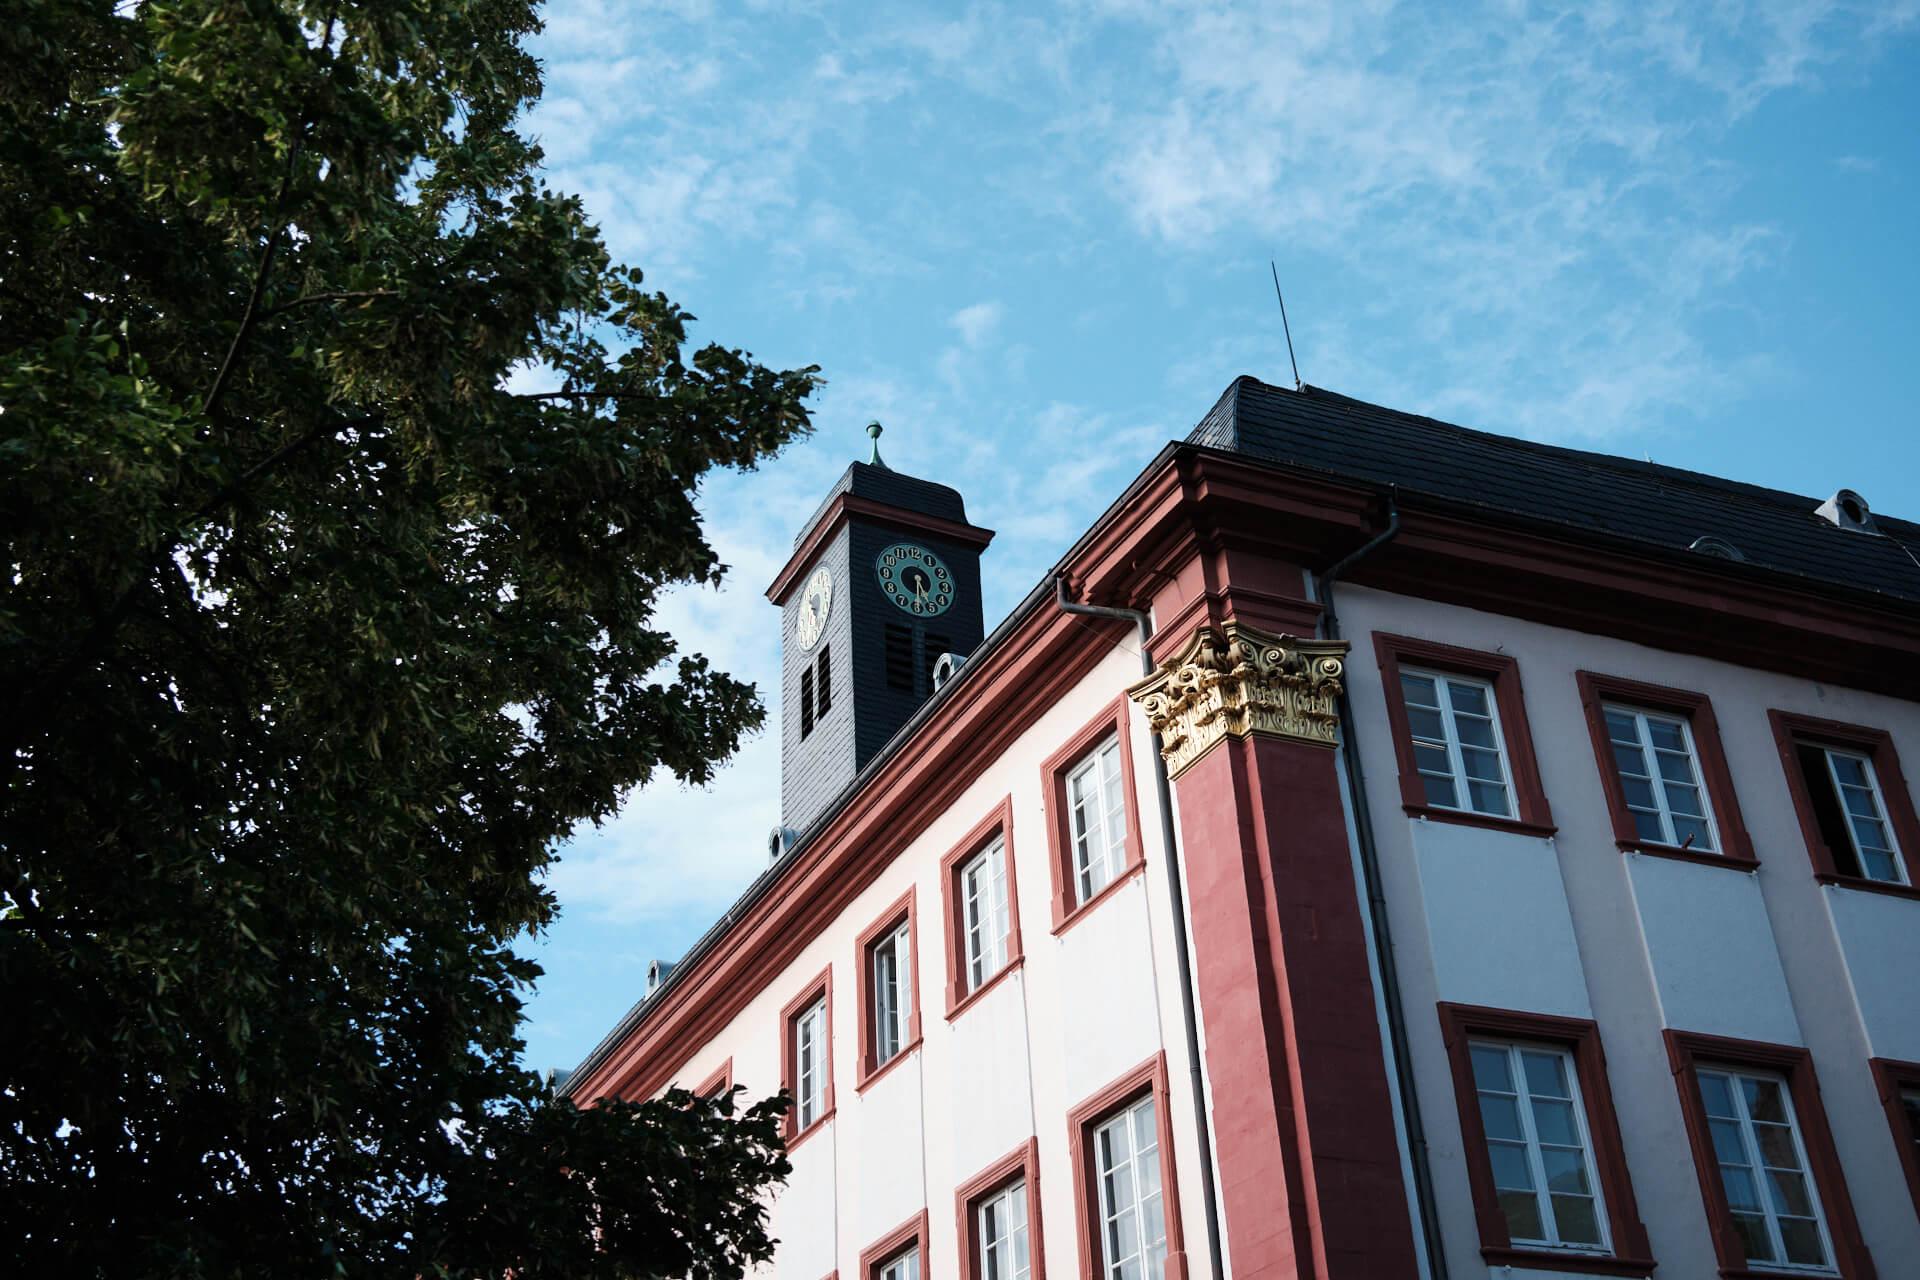 Universität-Heidelberg-Gastronomie